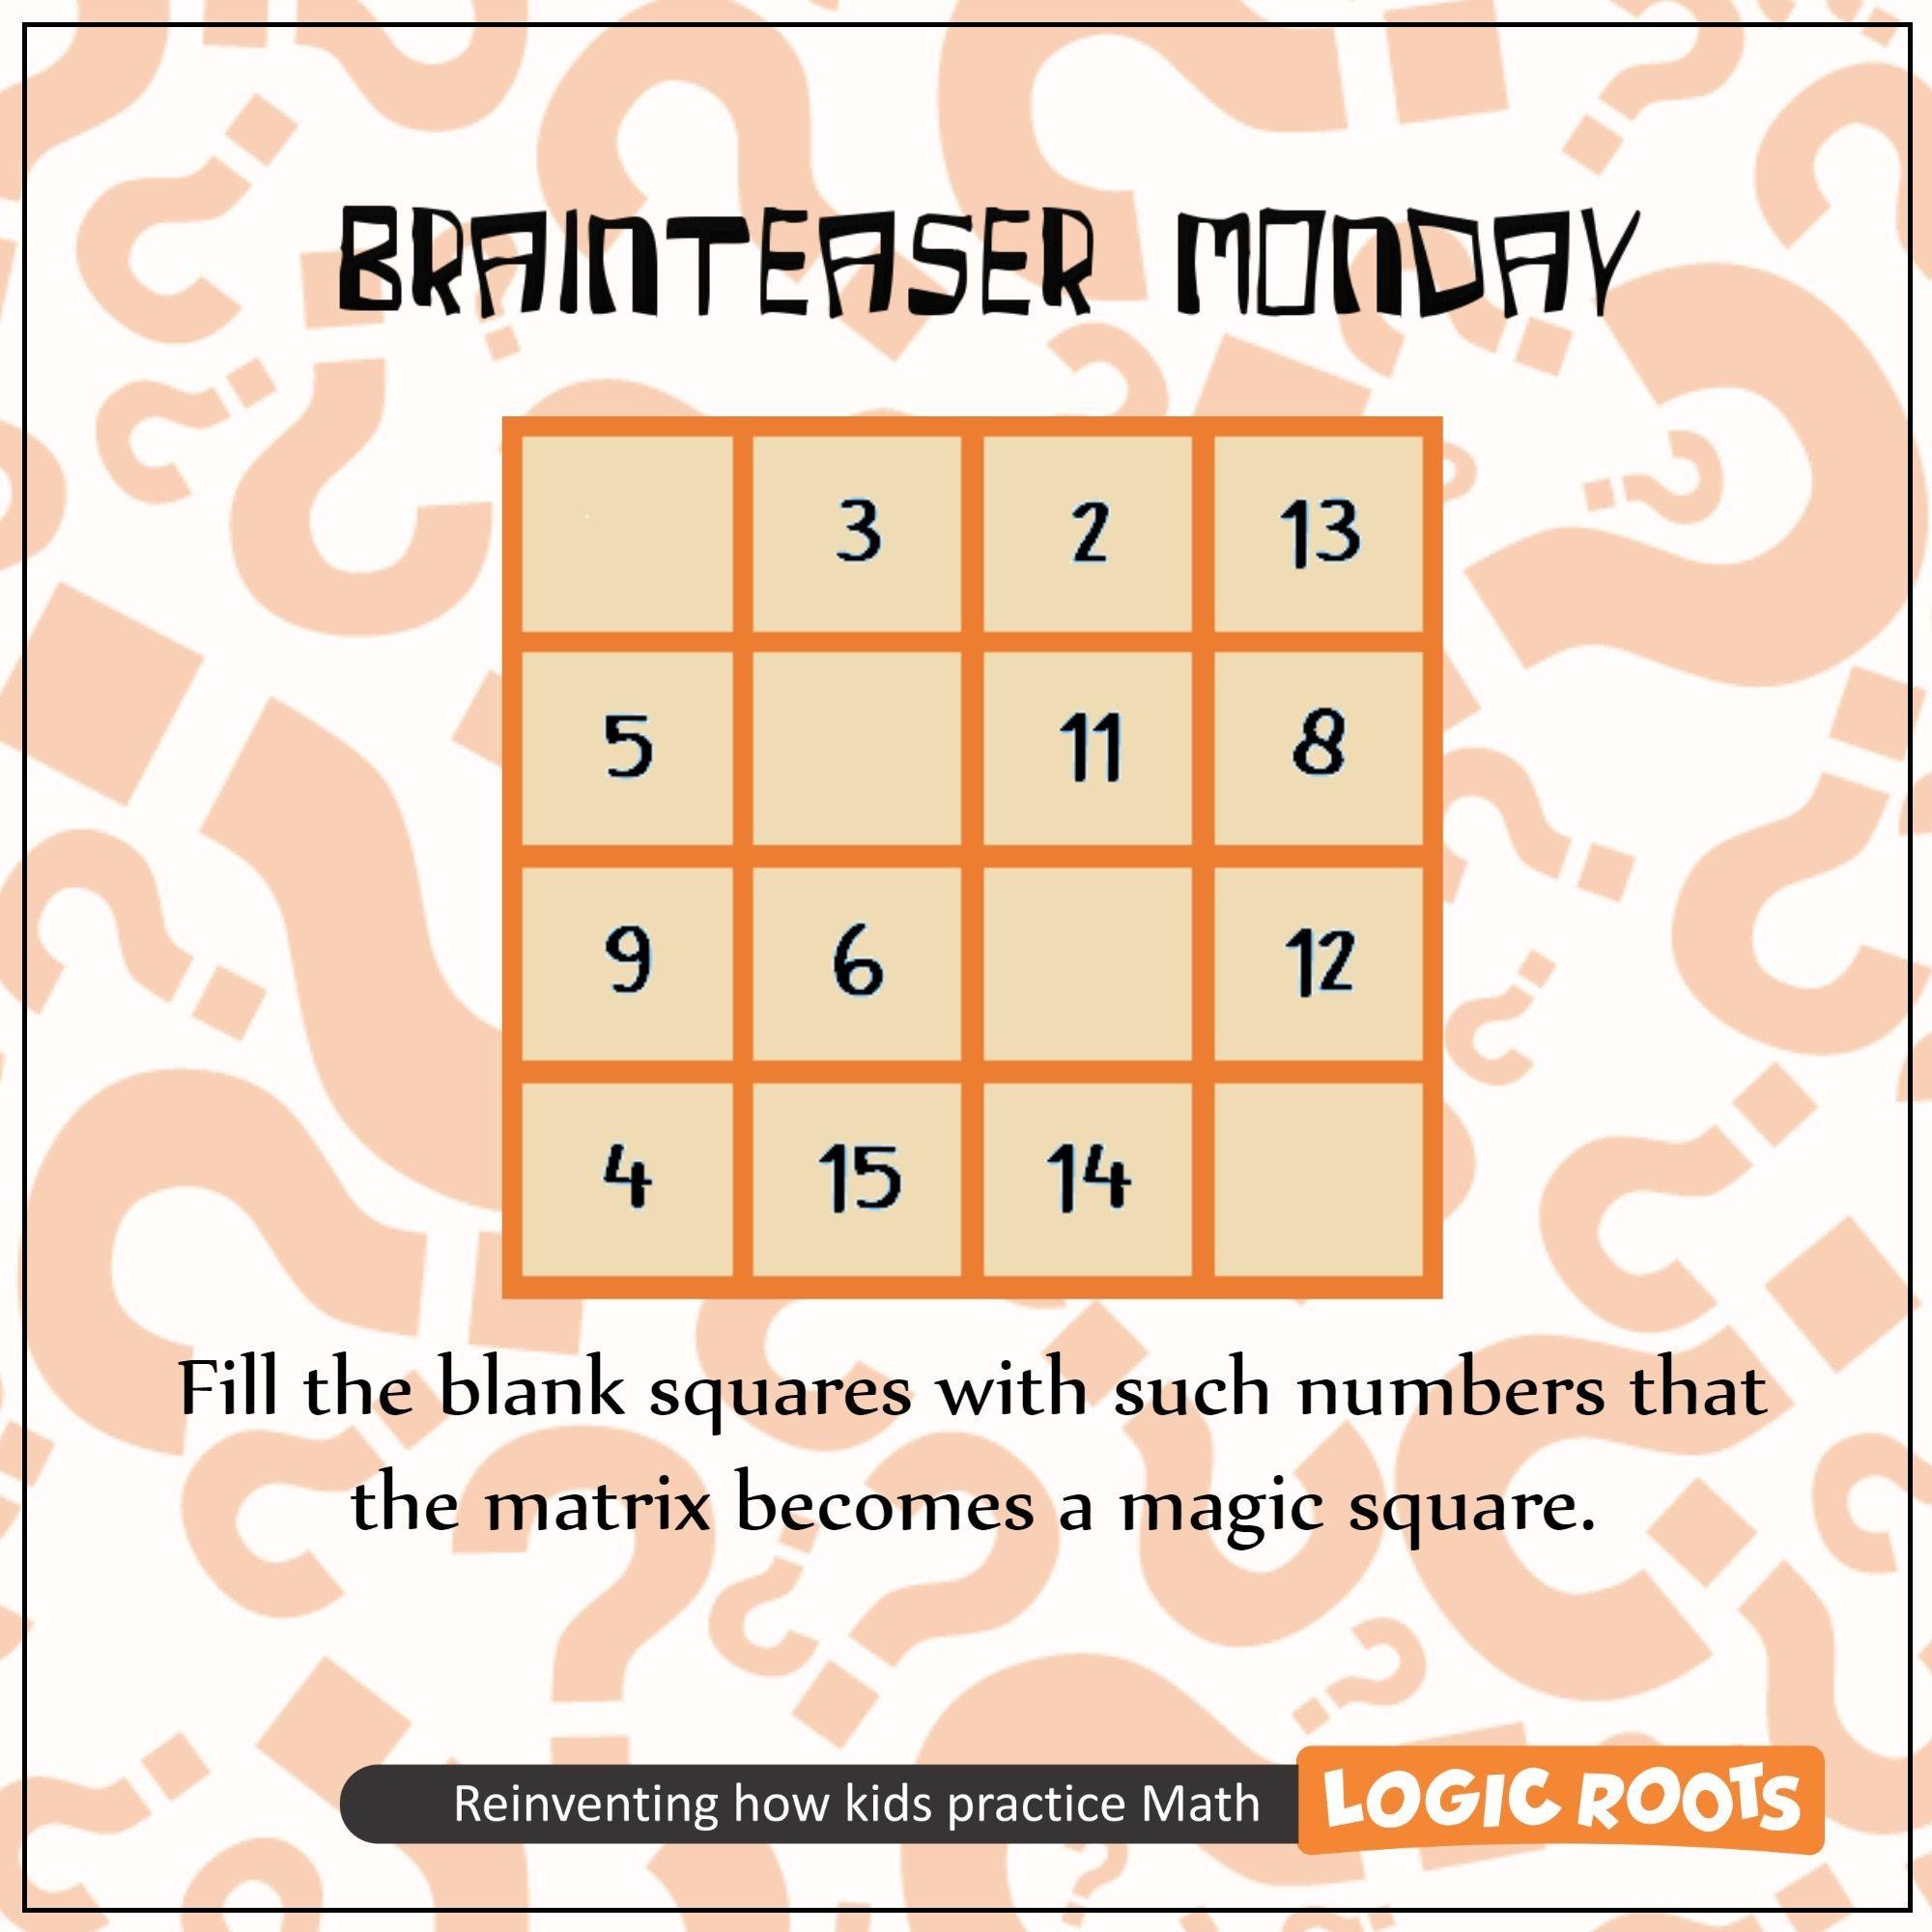 26 Matriks Matrices Buku Catatan Matematika Matematika Kelas 5 Belajar